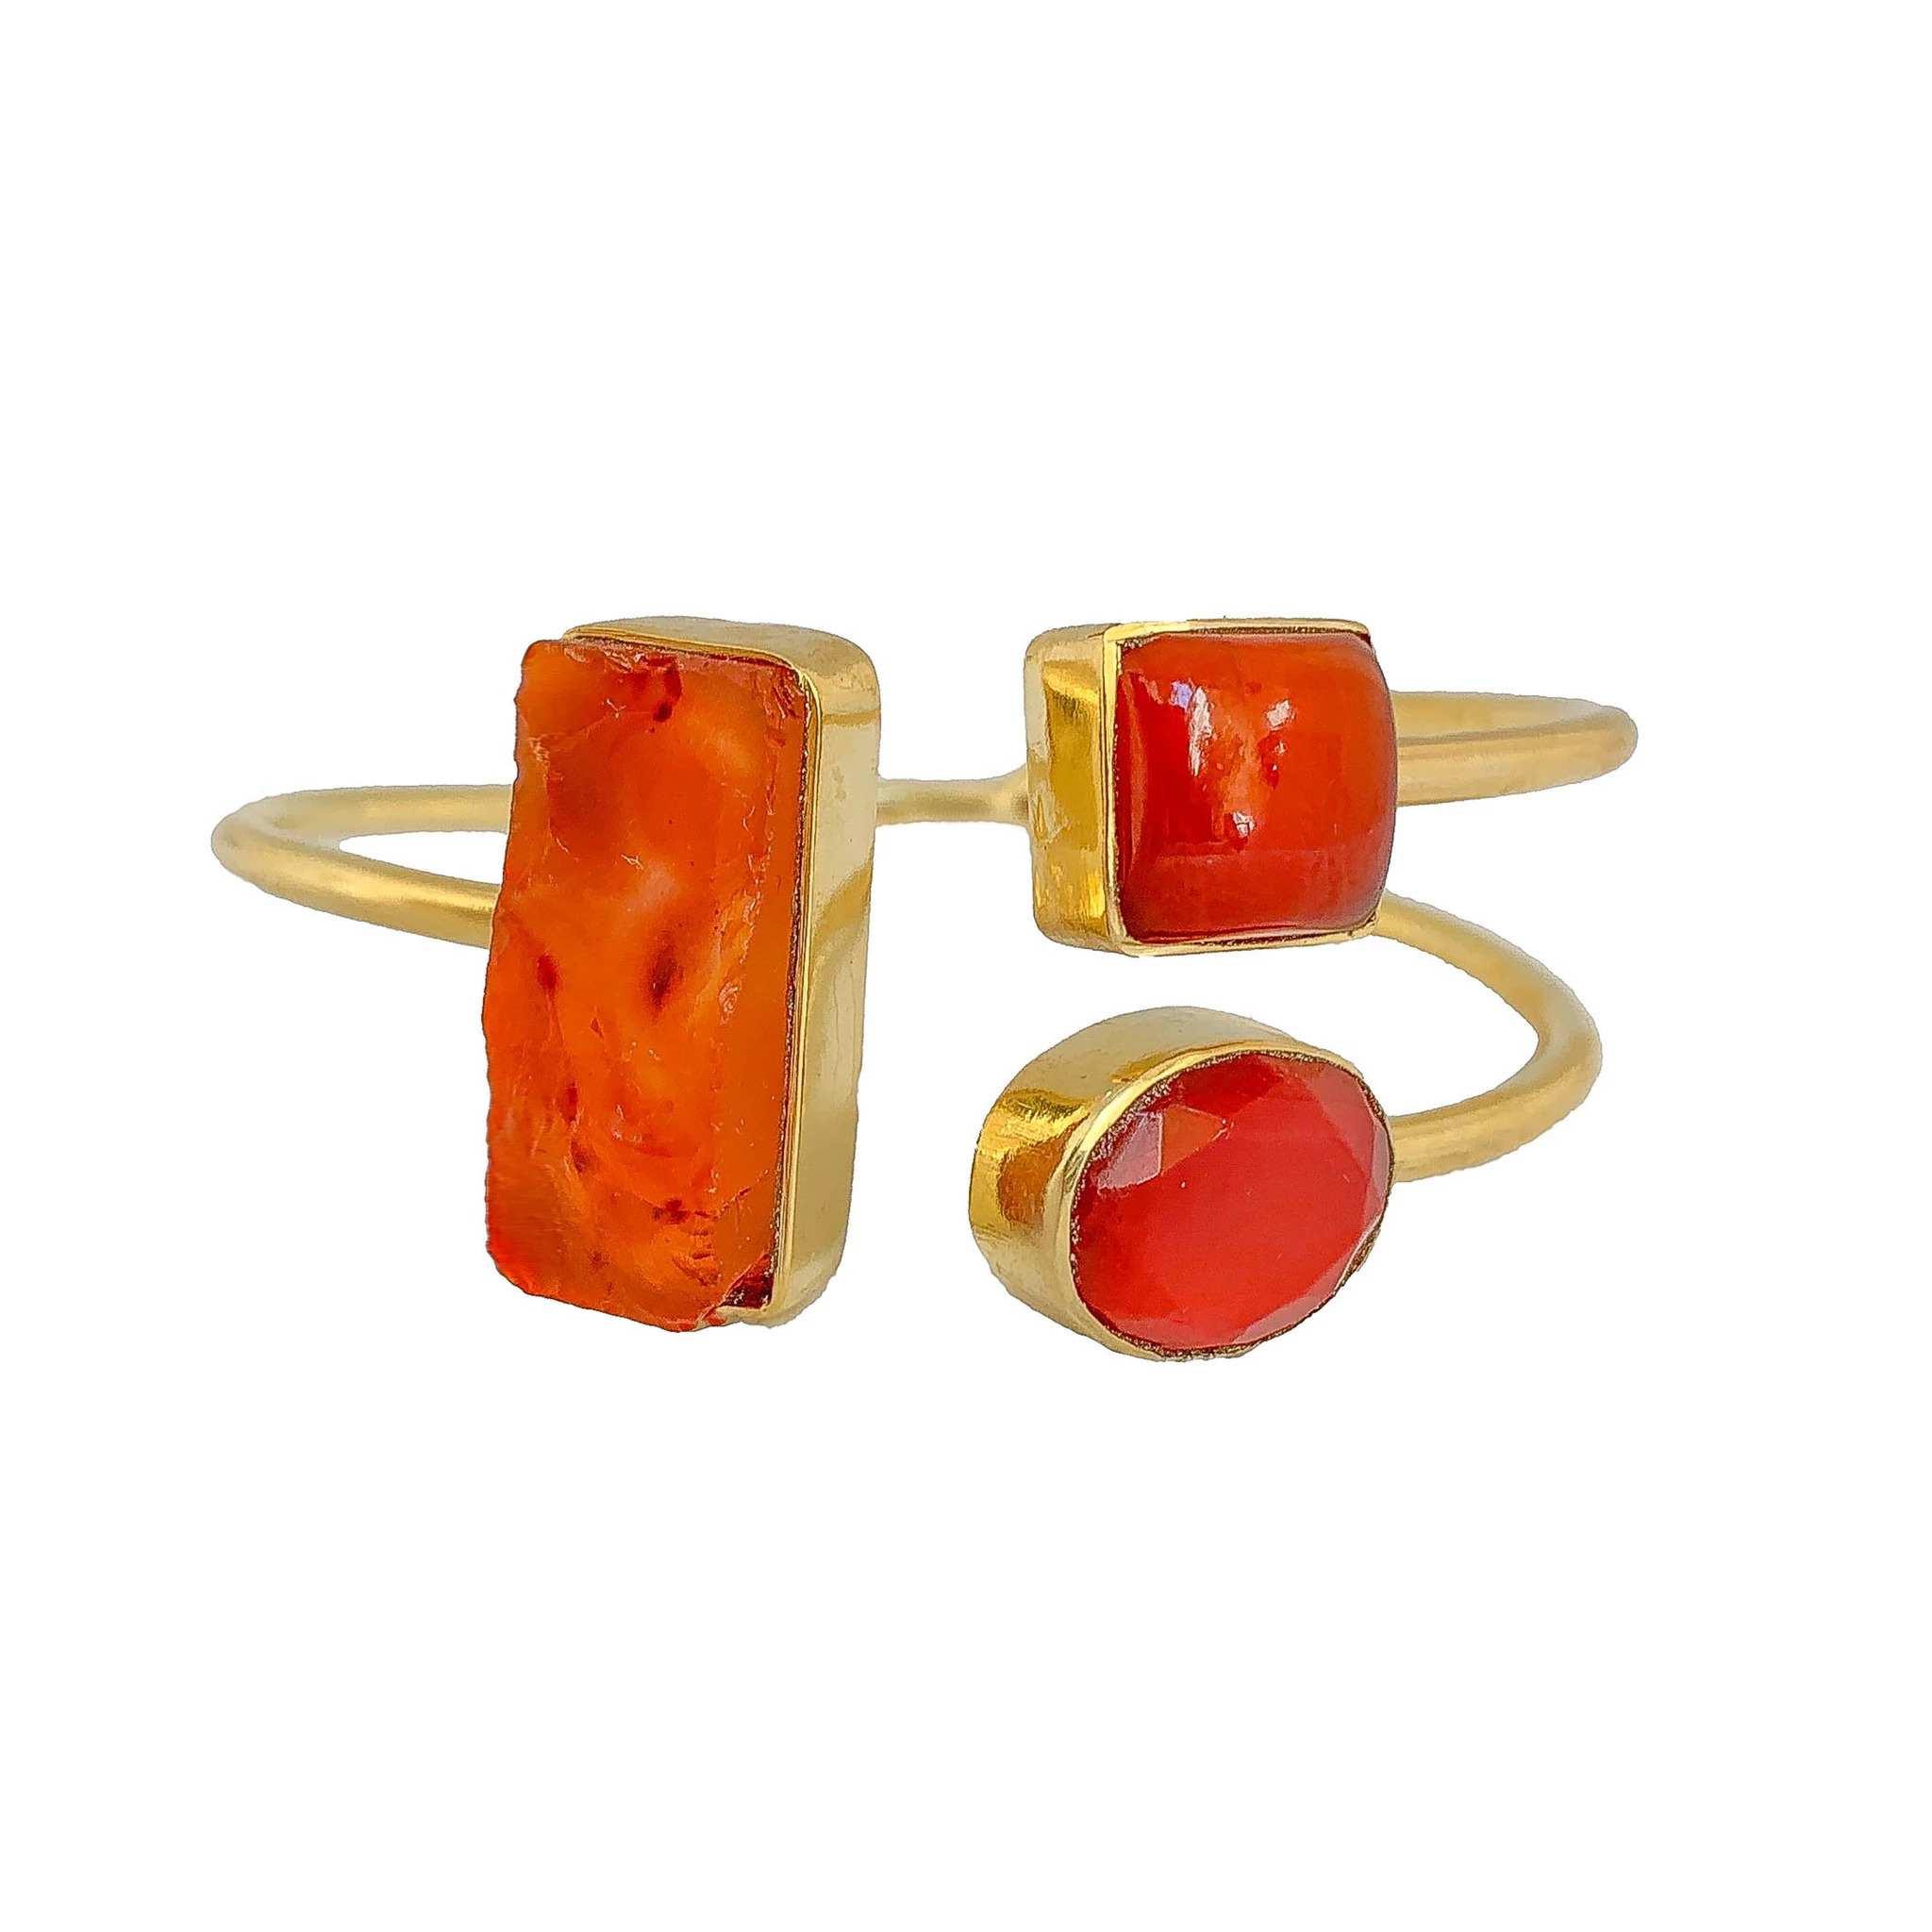 Tanya litkovska Women's Red Era Bangle Bracelet